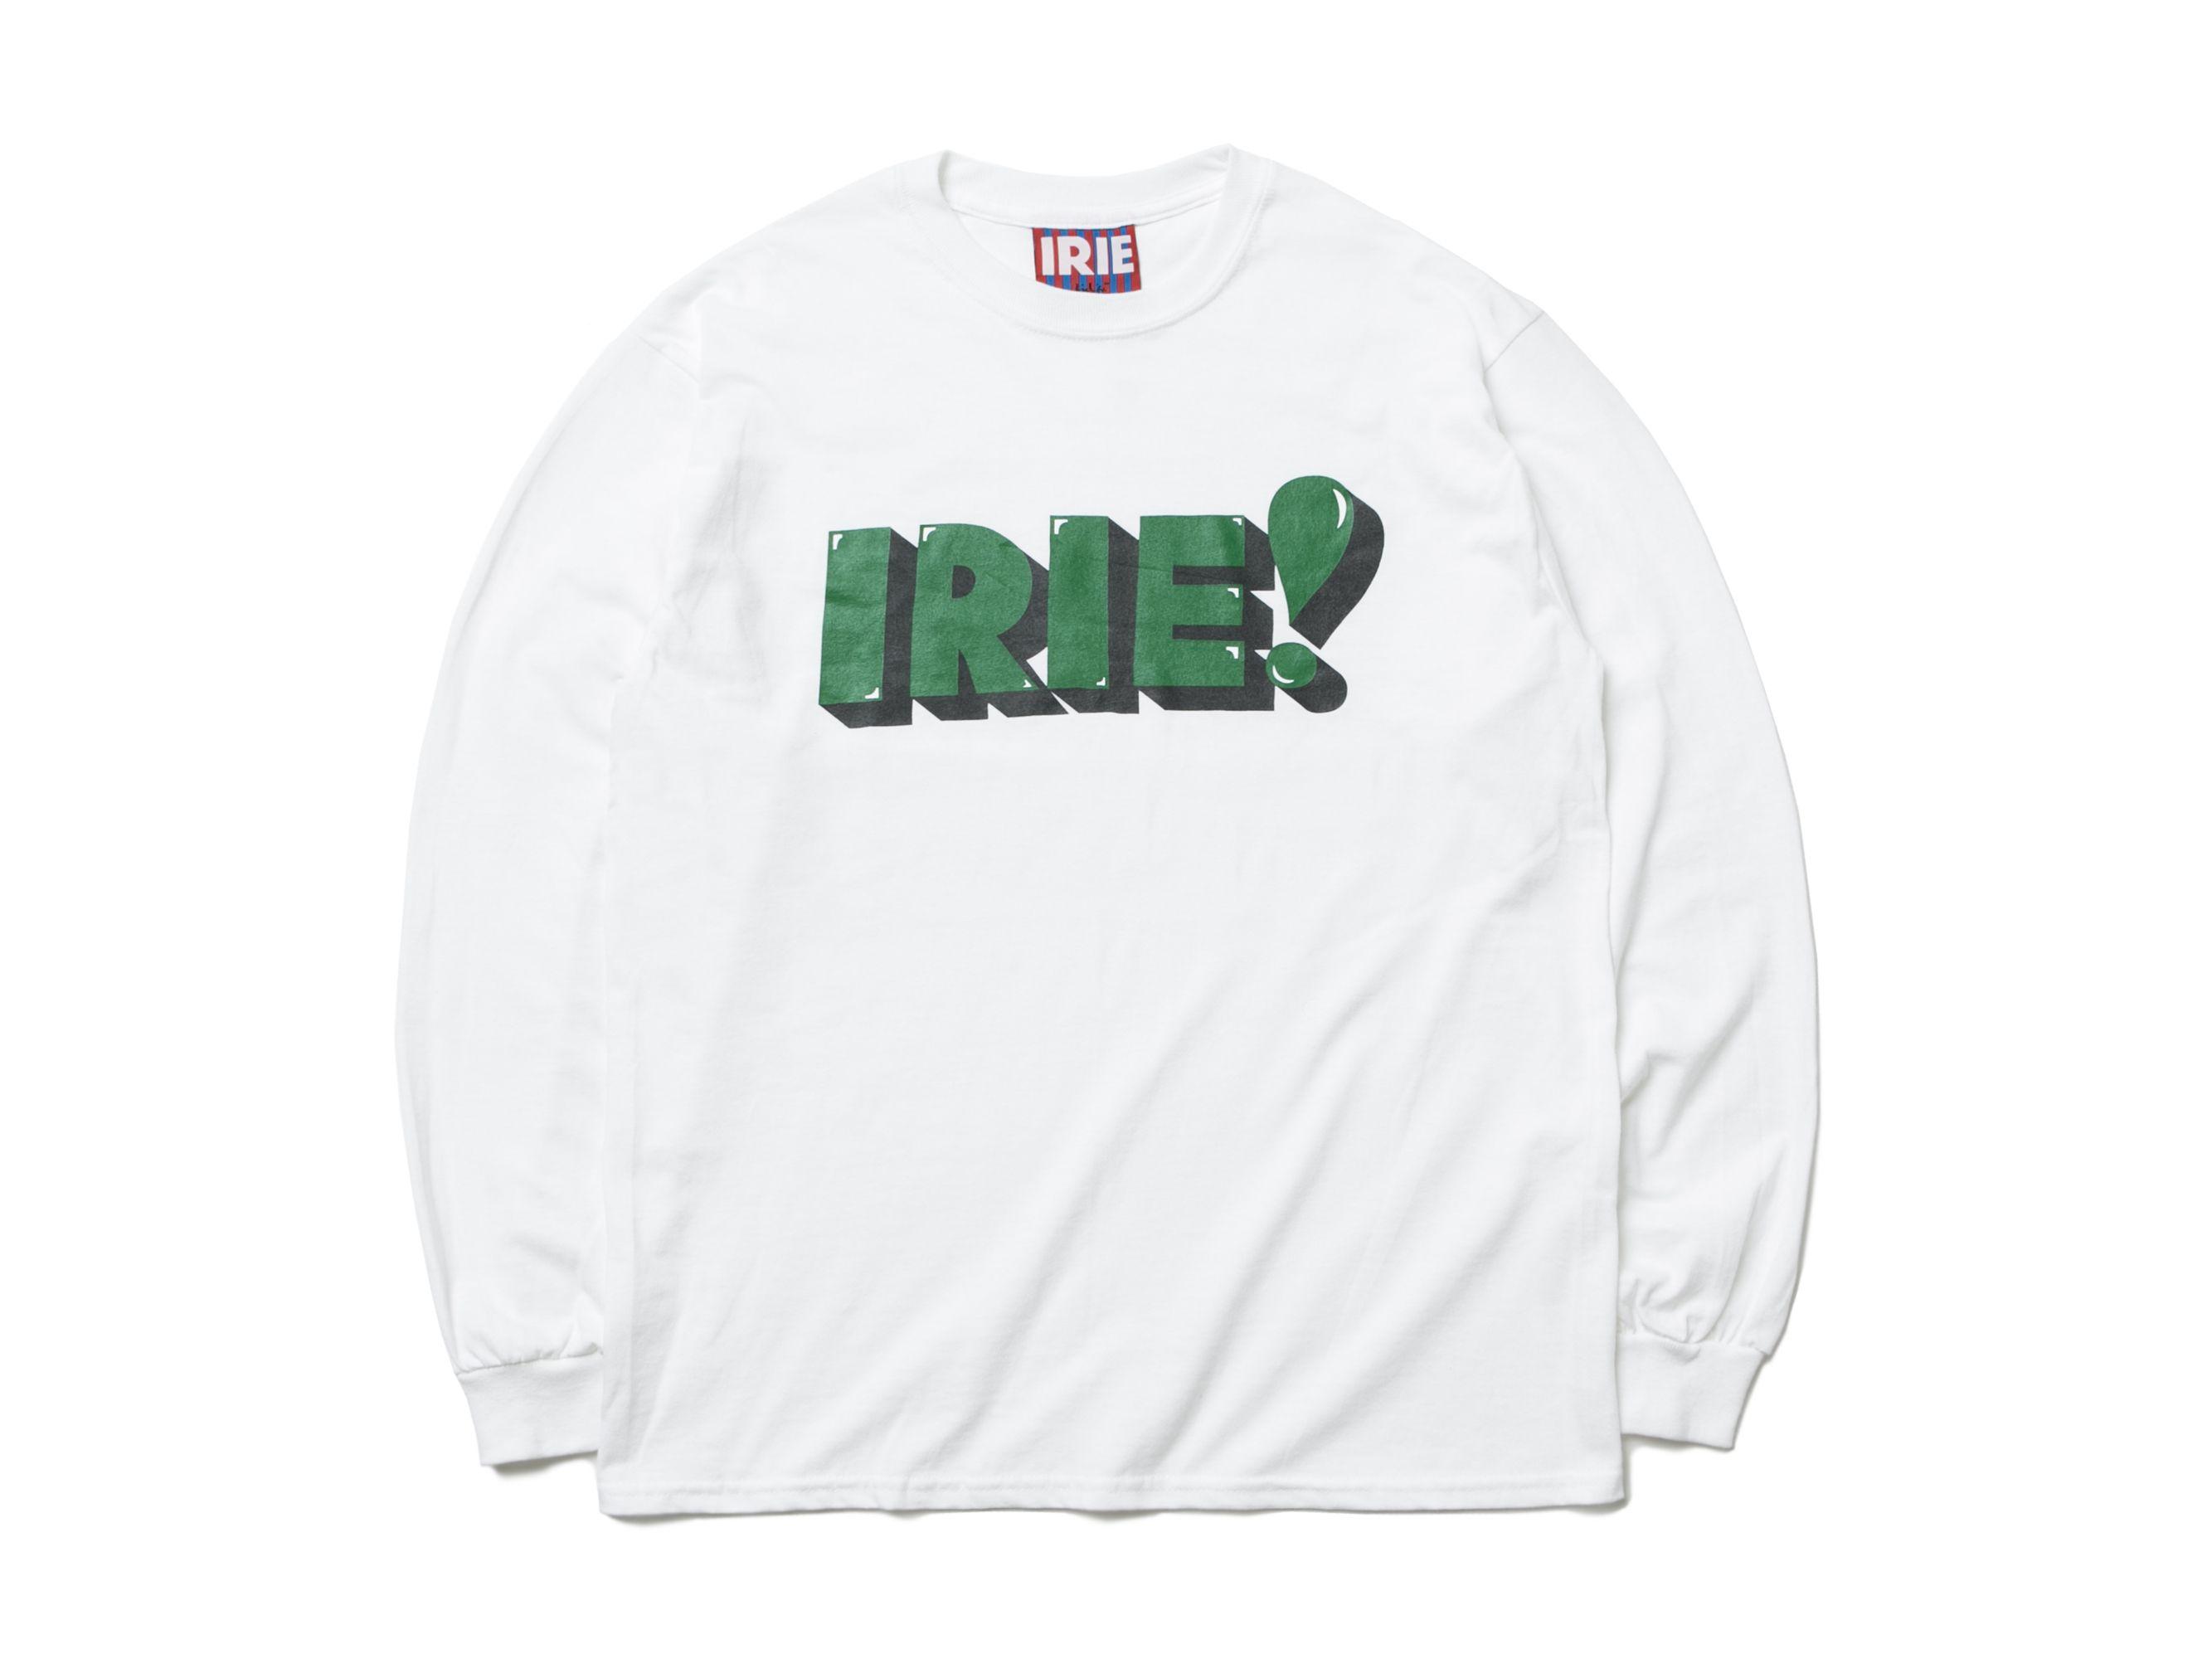 IRIE! L/S TEE -IRIEby irielife-